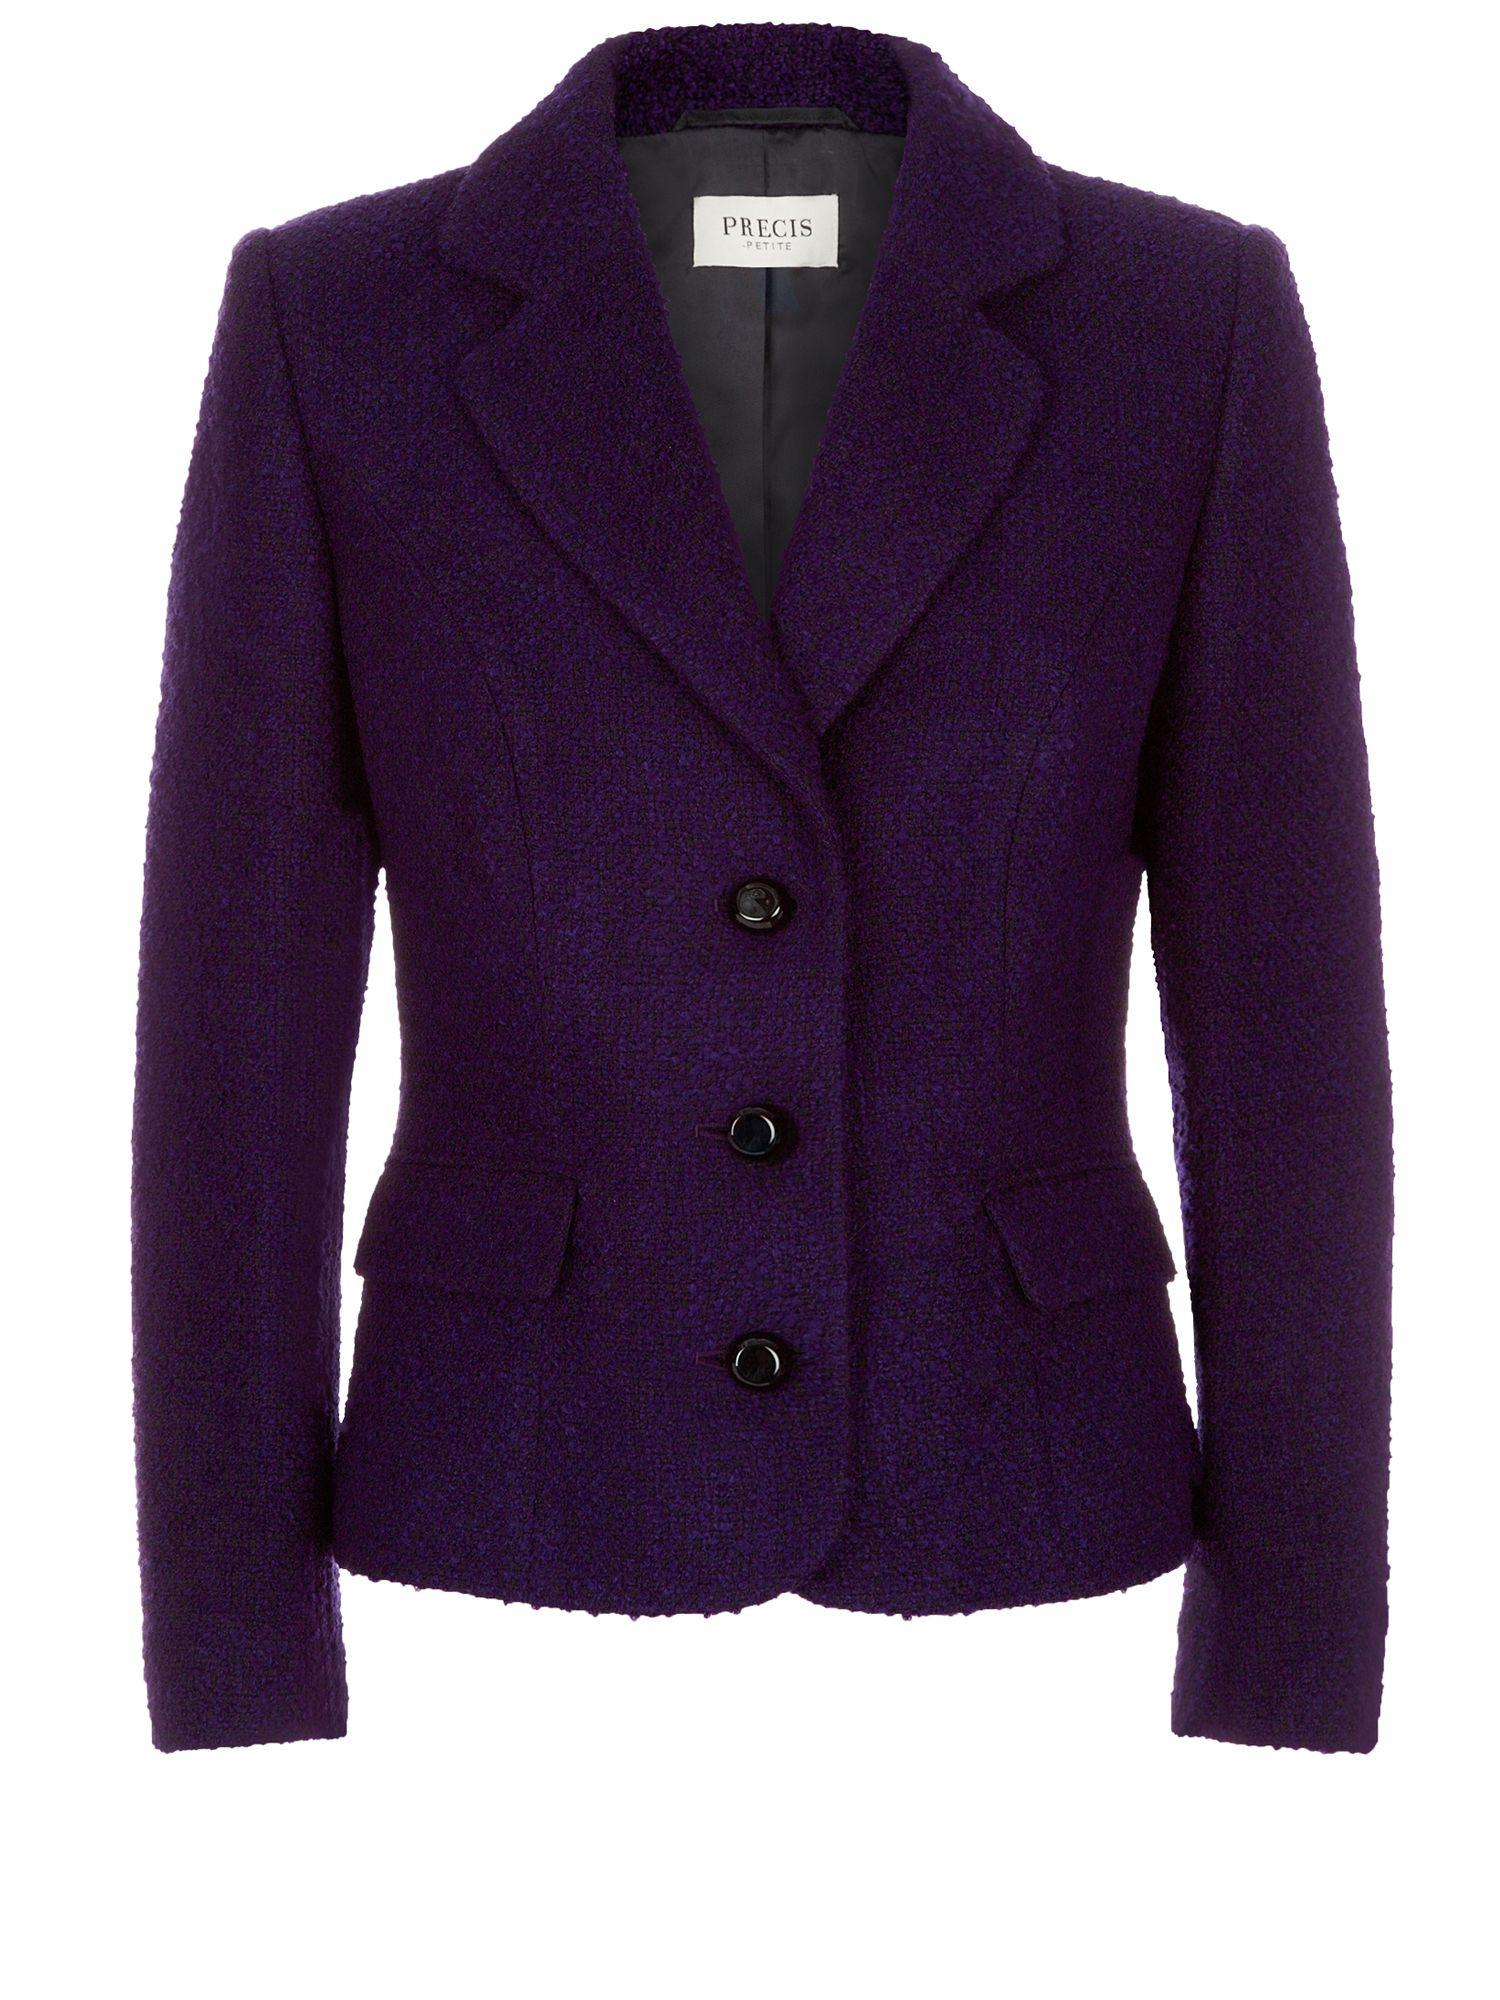 Lyst Precis Petite Purple Boucle Jacket In Purple